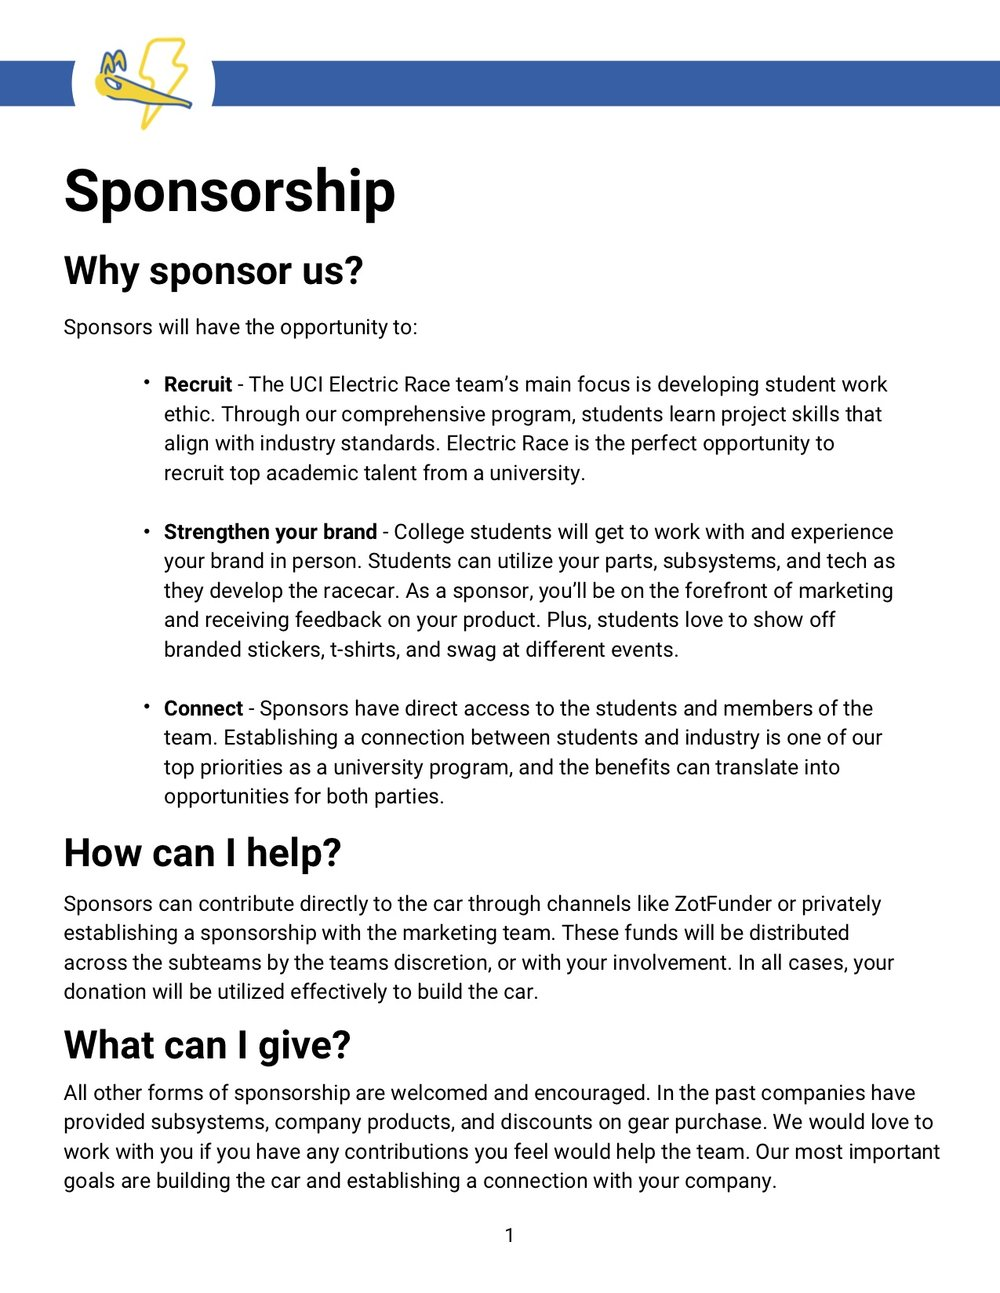 sponsorship1.jpg